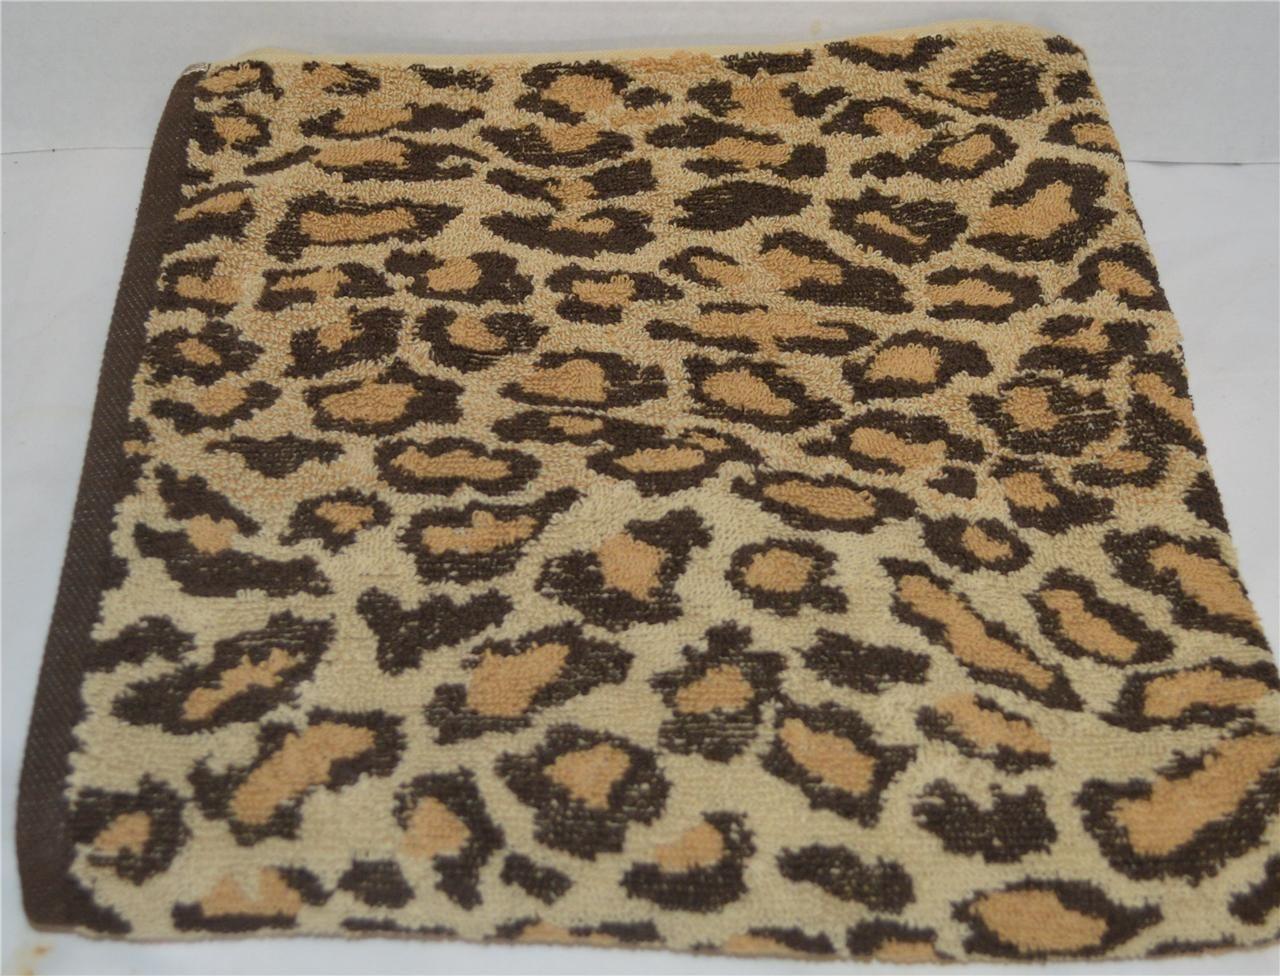 Ralph Lauren Venedik Mahkemesi Leopard Banyo Havlu El